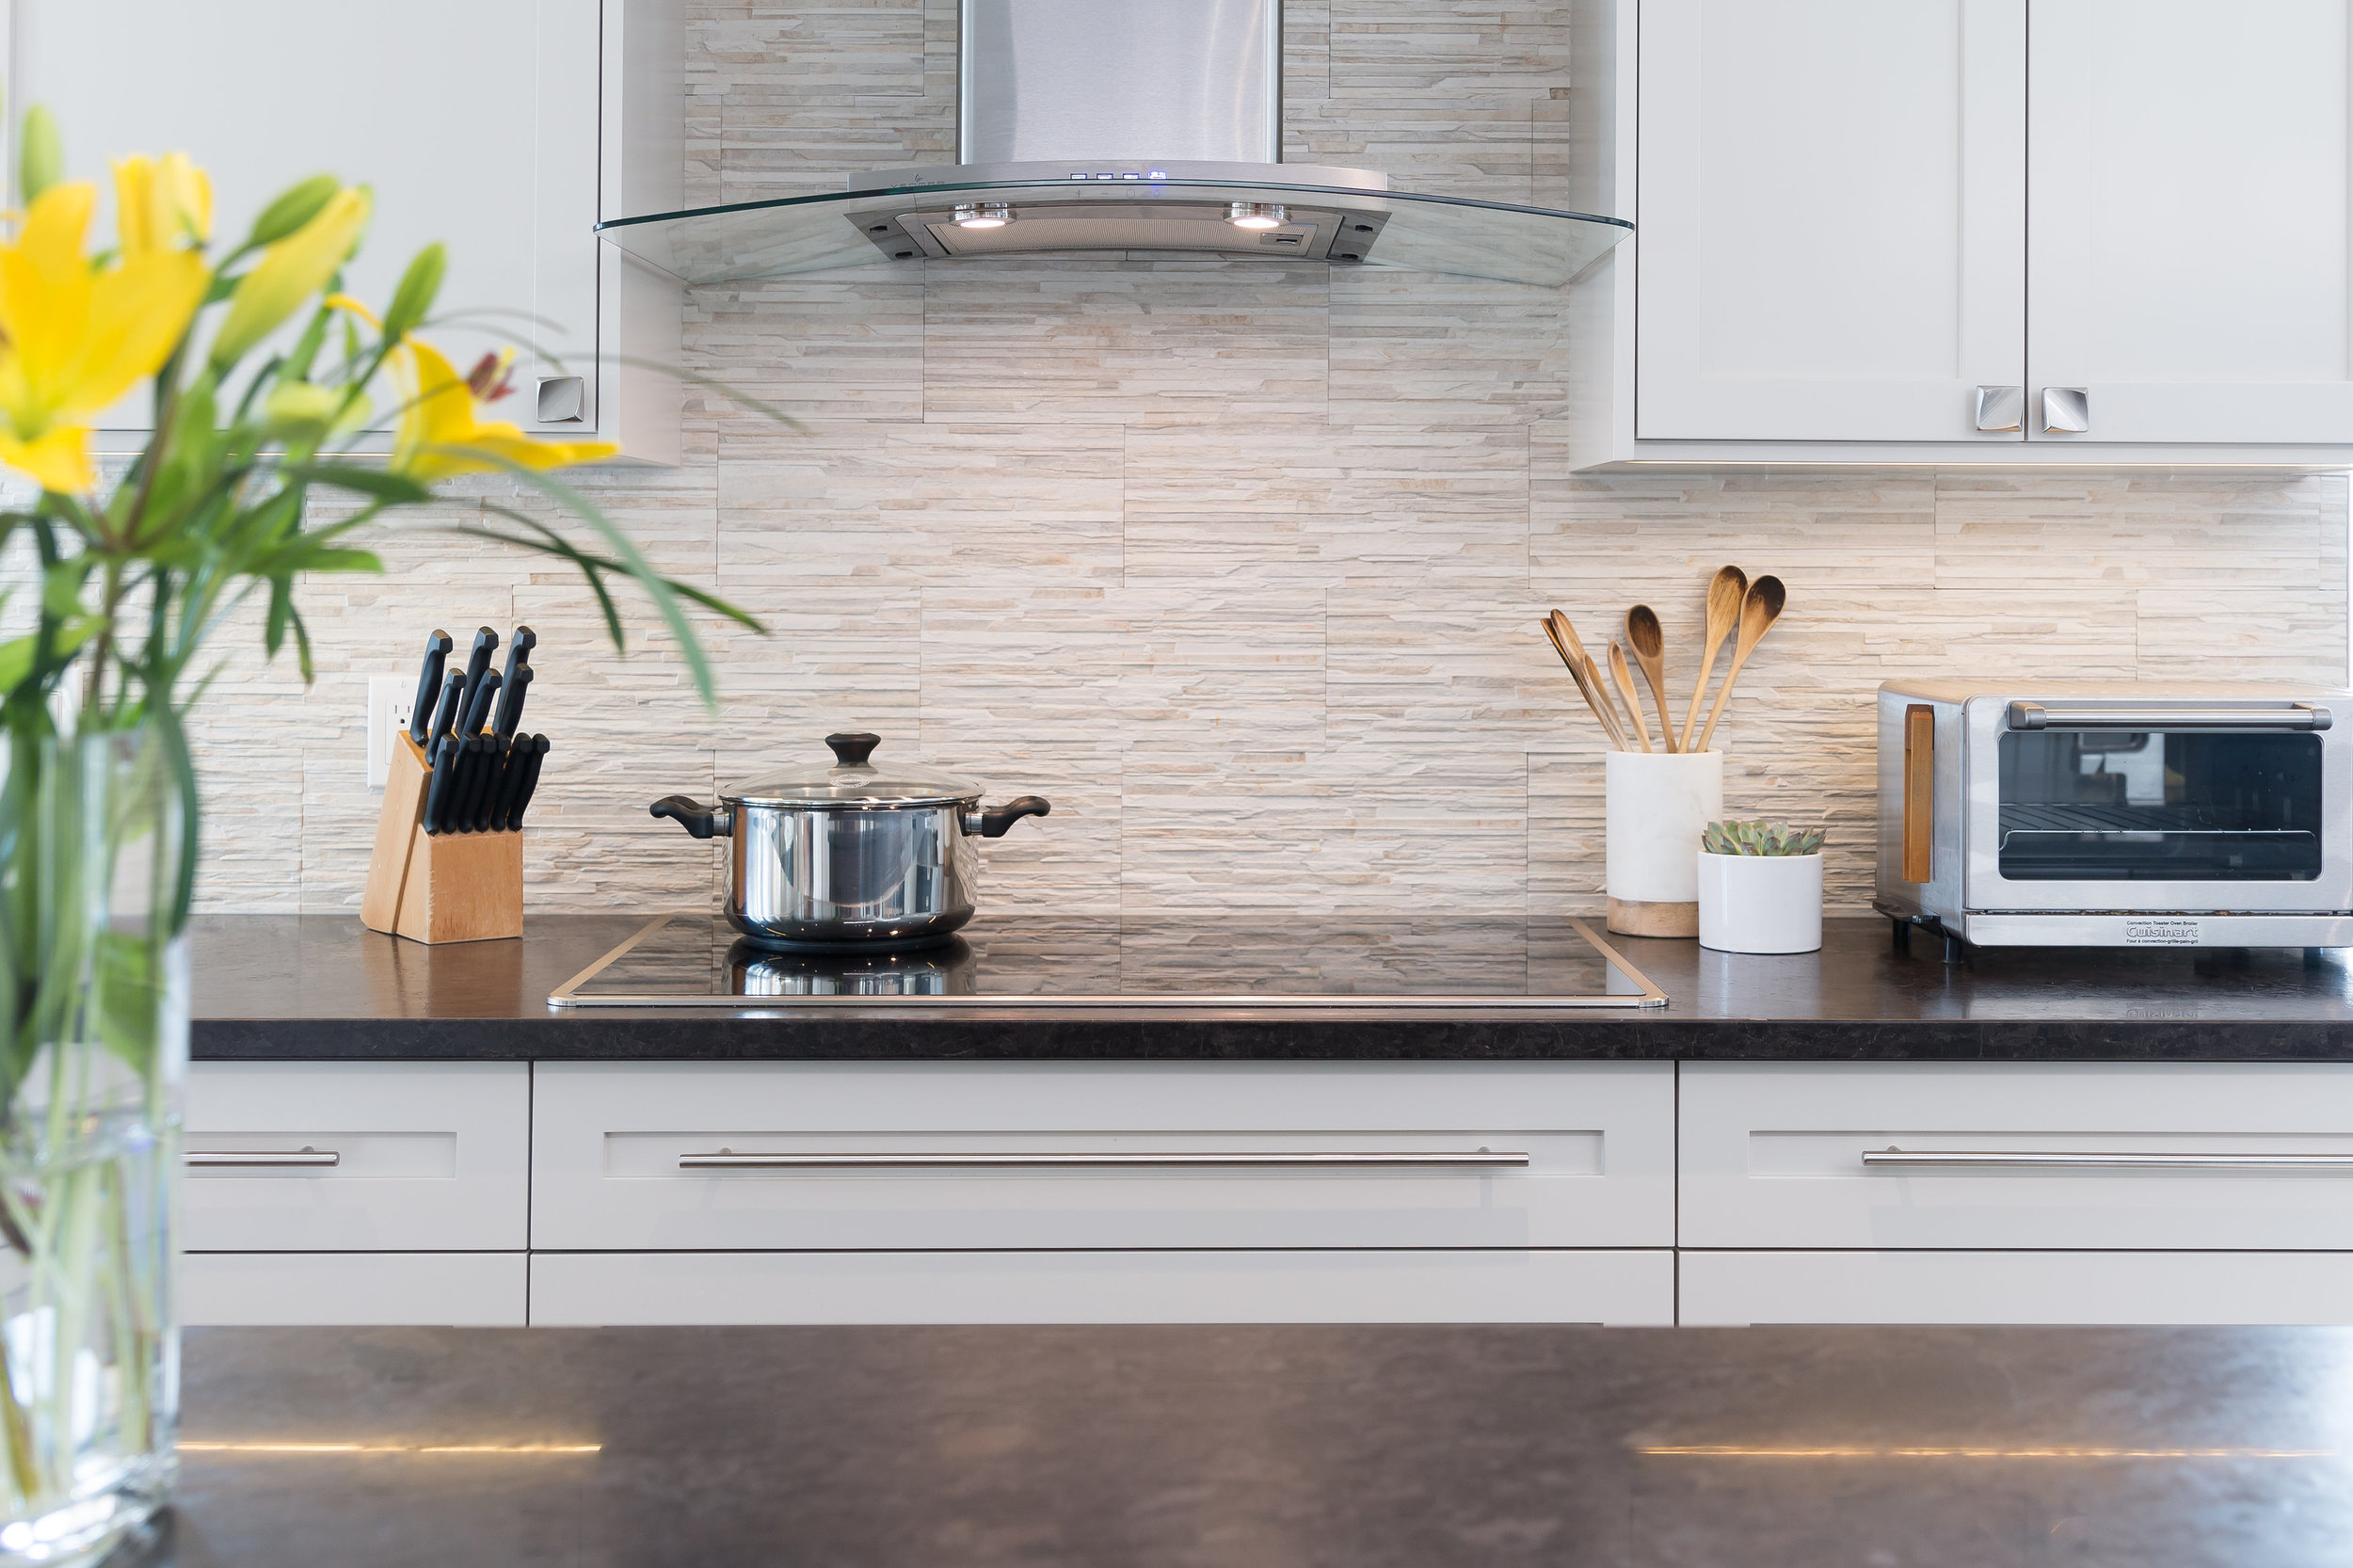 Calgary Modern Interior Design Kitchen 1.jpg